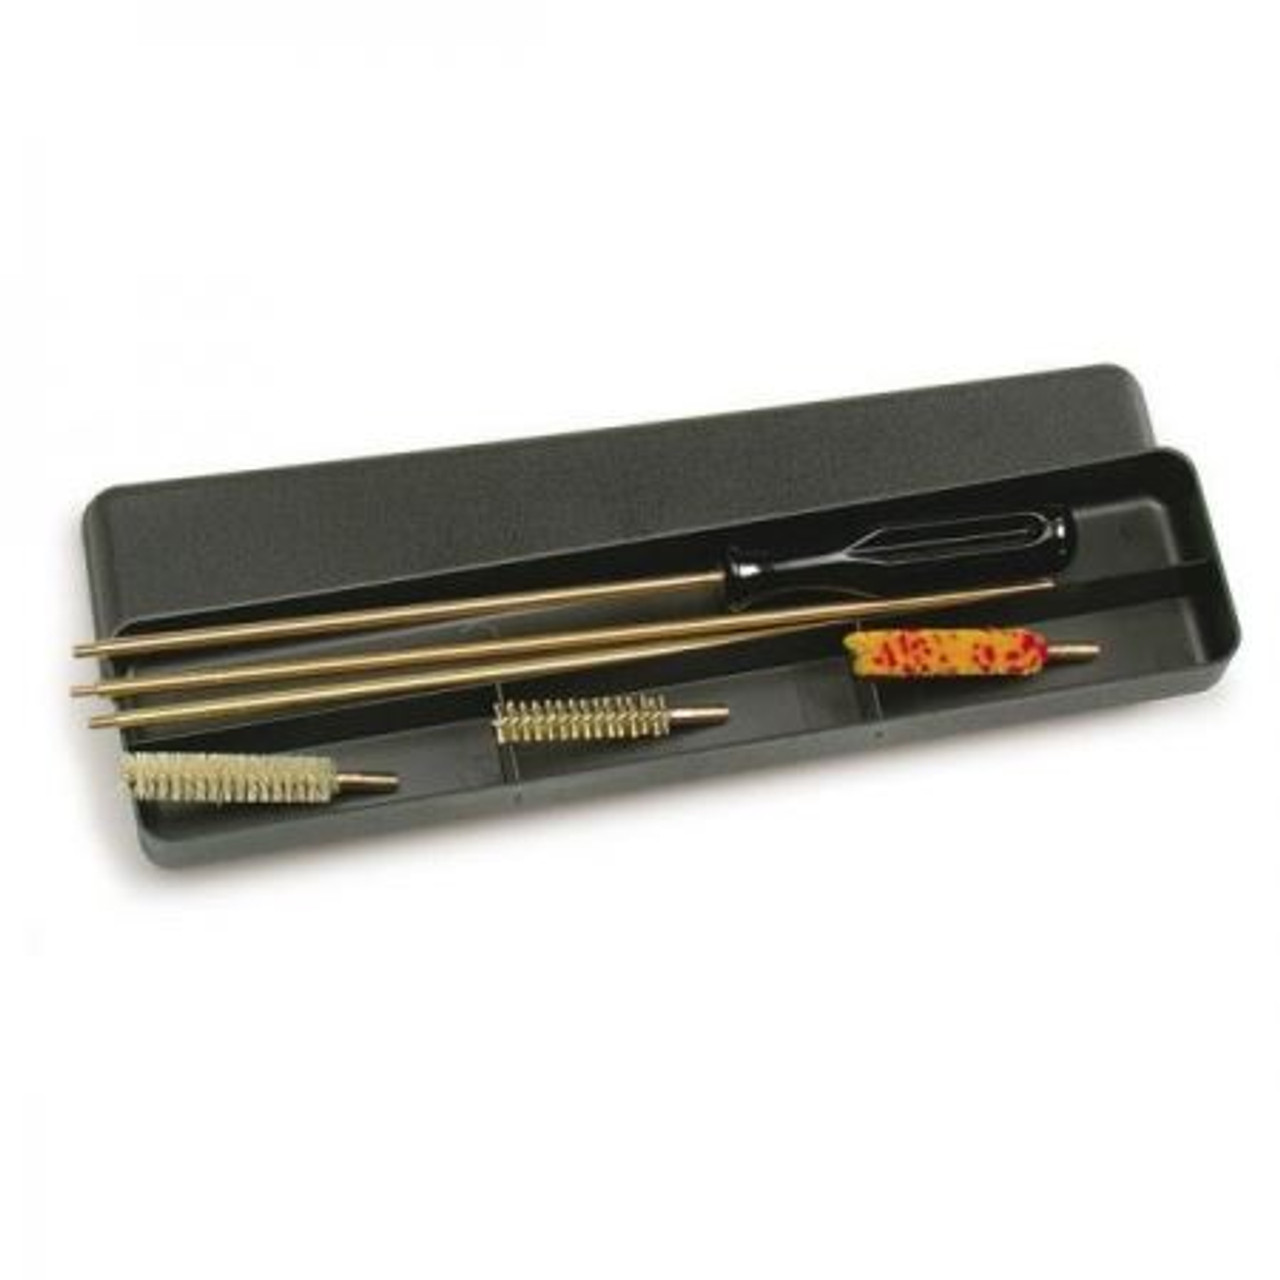 Bisley Airgun Cleaning Kit